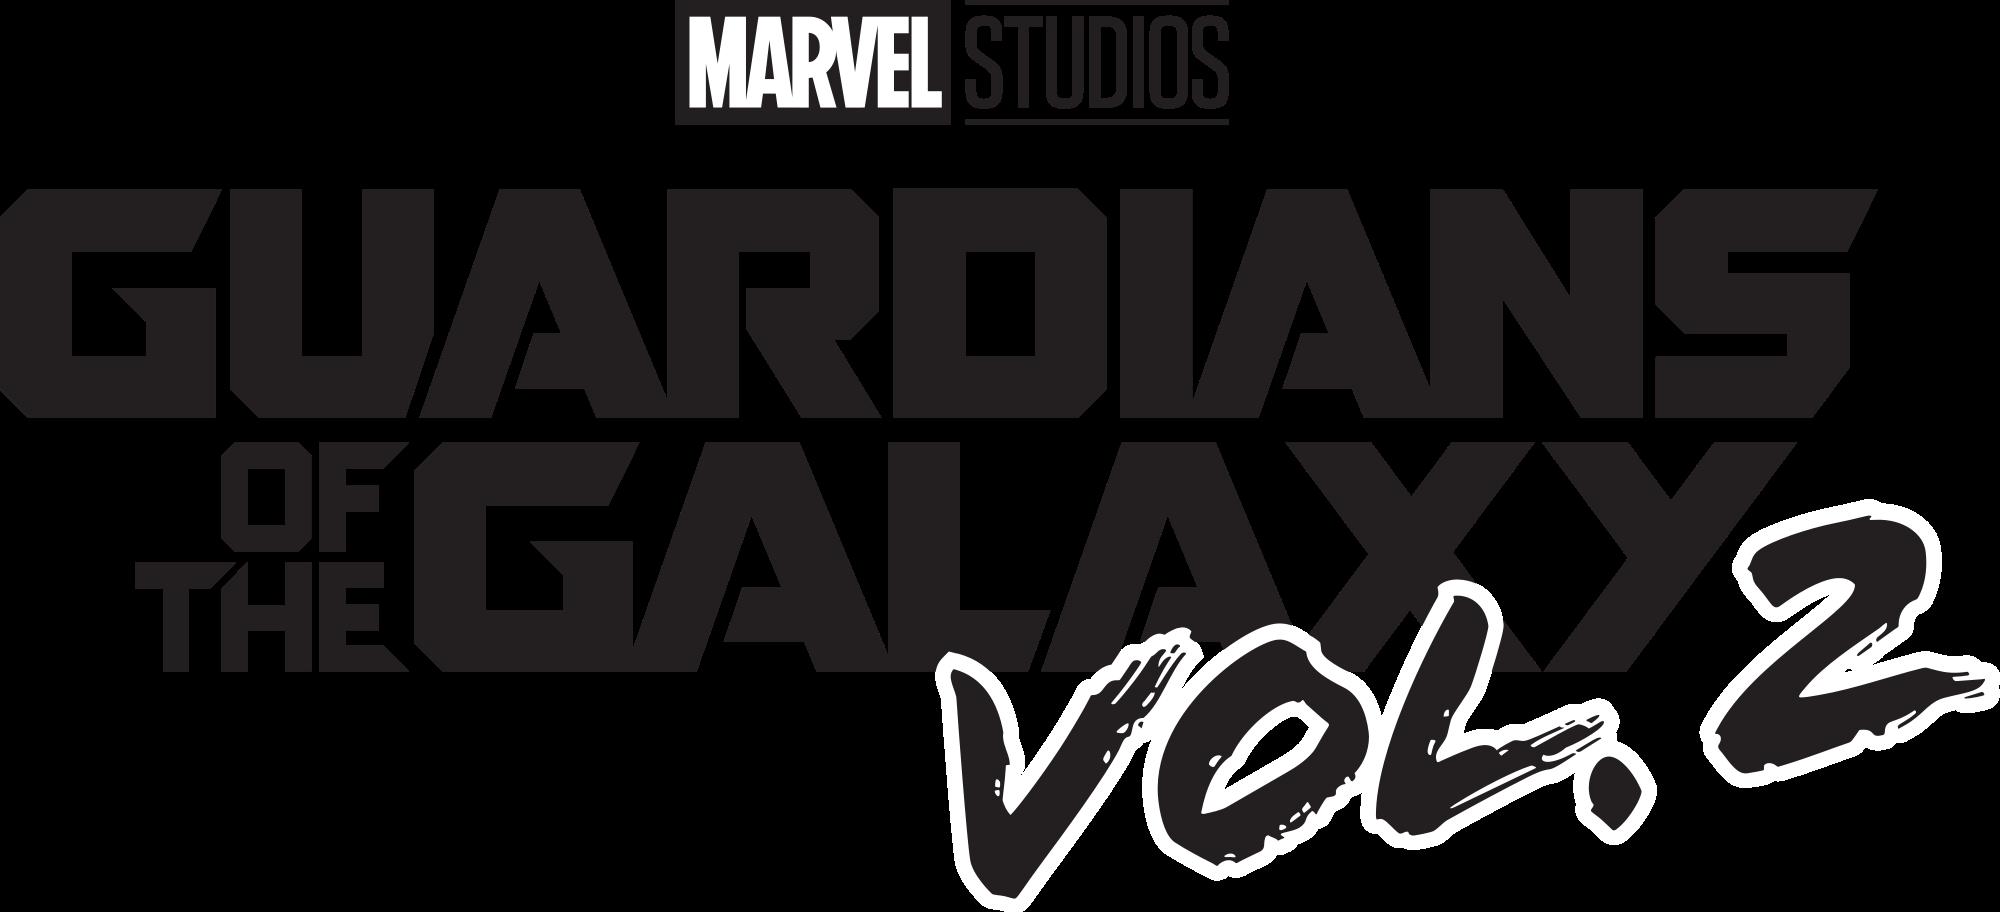 2000x912 Fileguardians Of The Galaxy Vol 2 Logo Black.svg